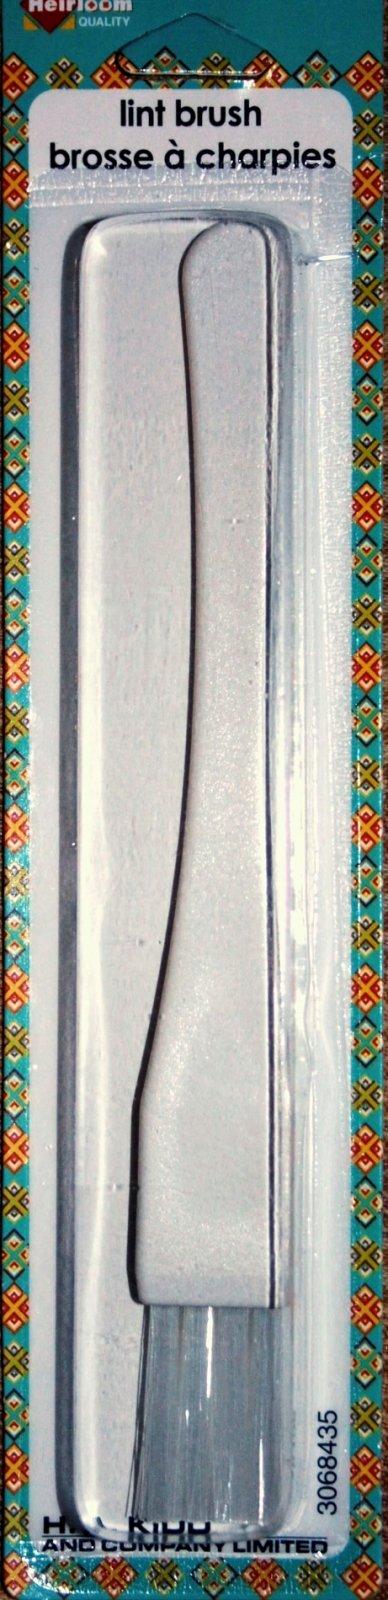 Heirloom lint brush